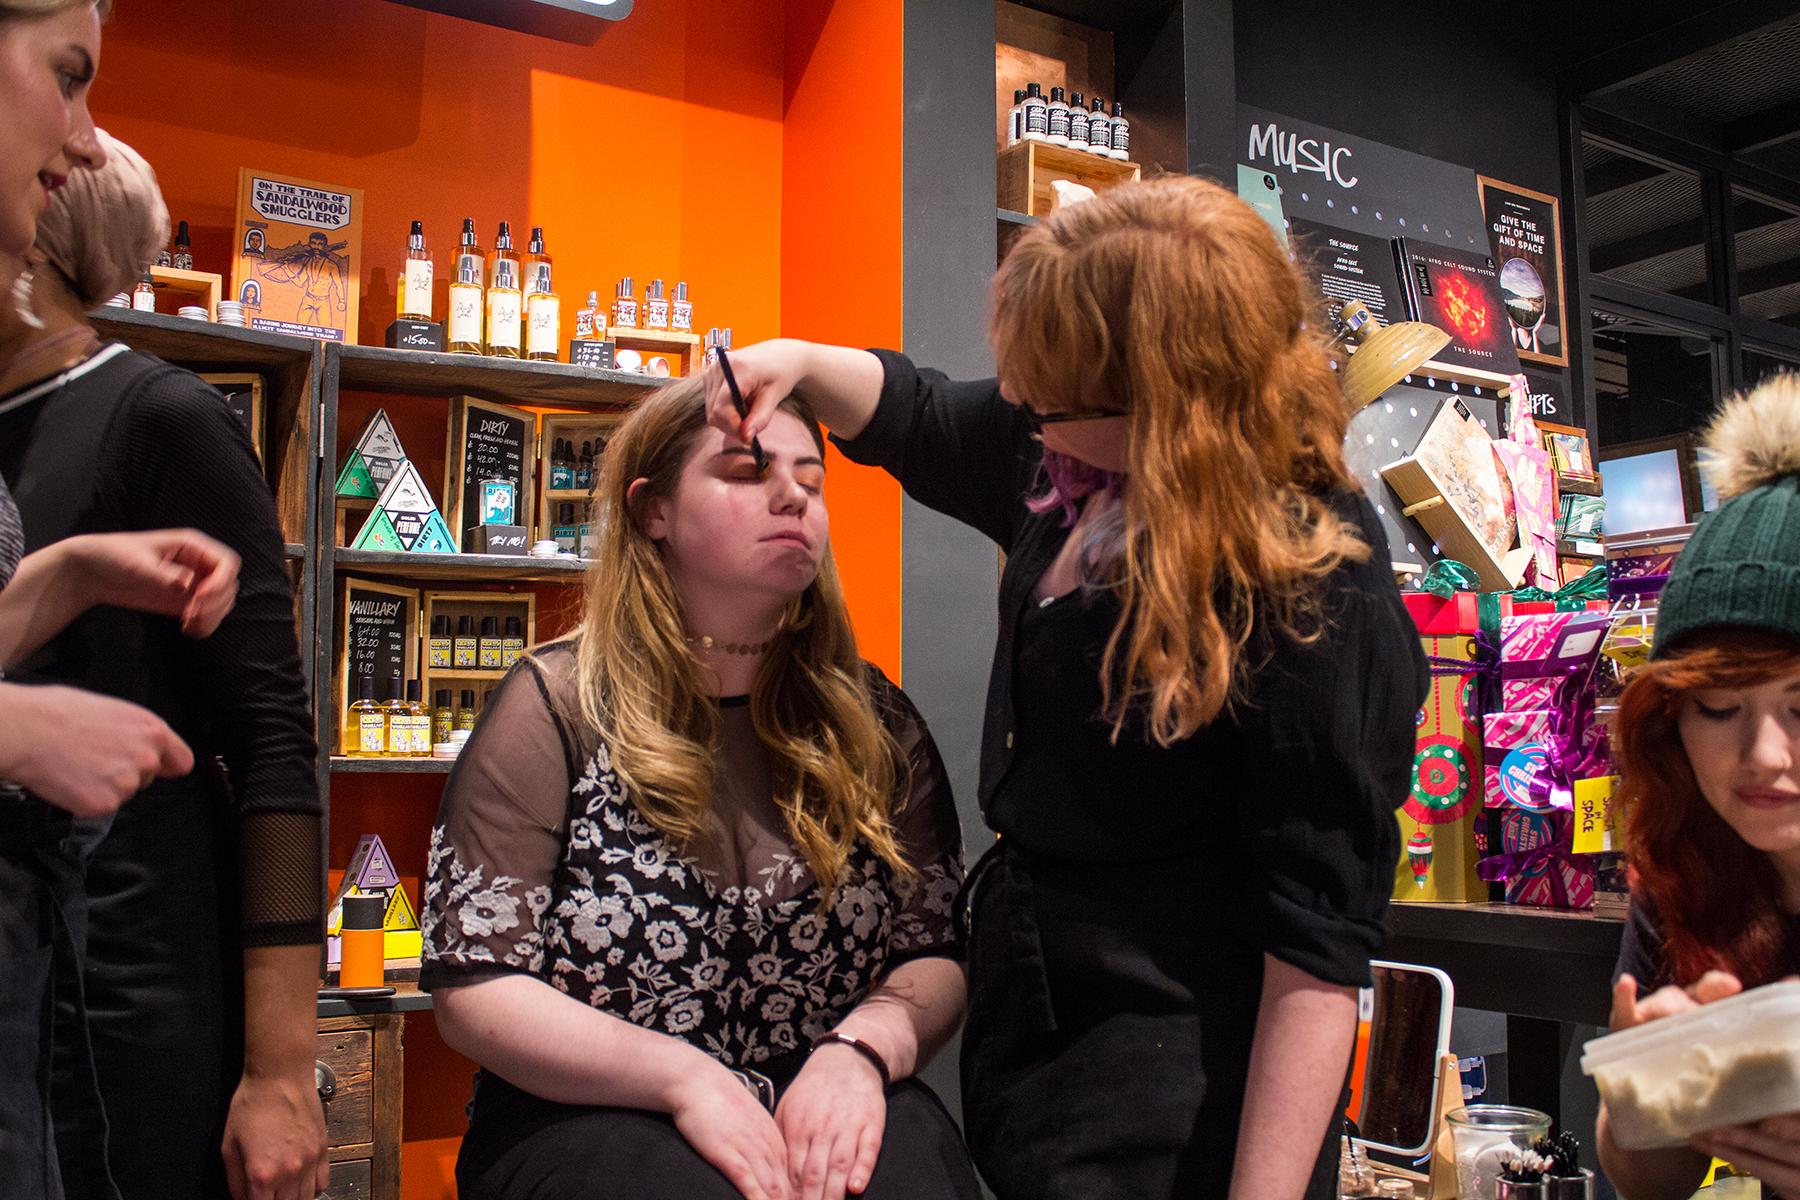 LUSH Arndale Beauty School Event // #9 of Blogmas '16